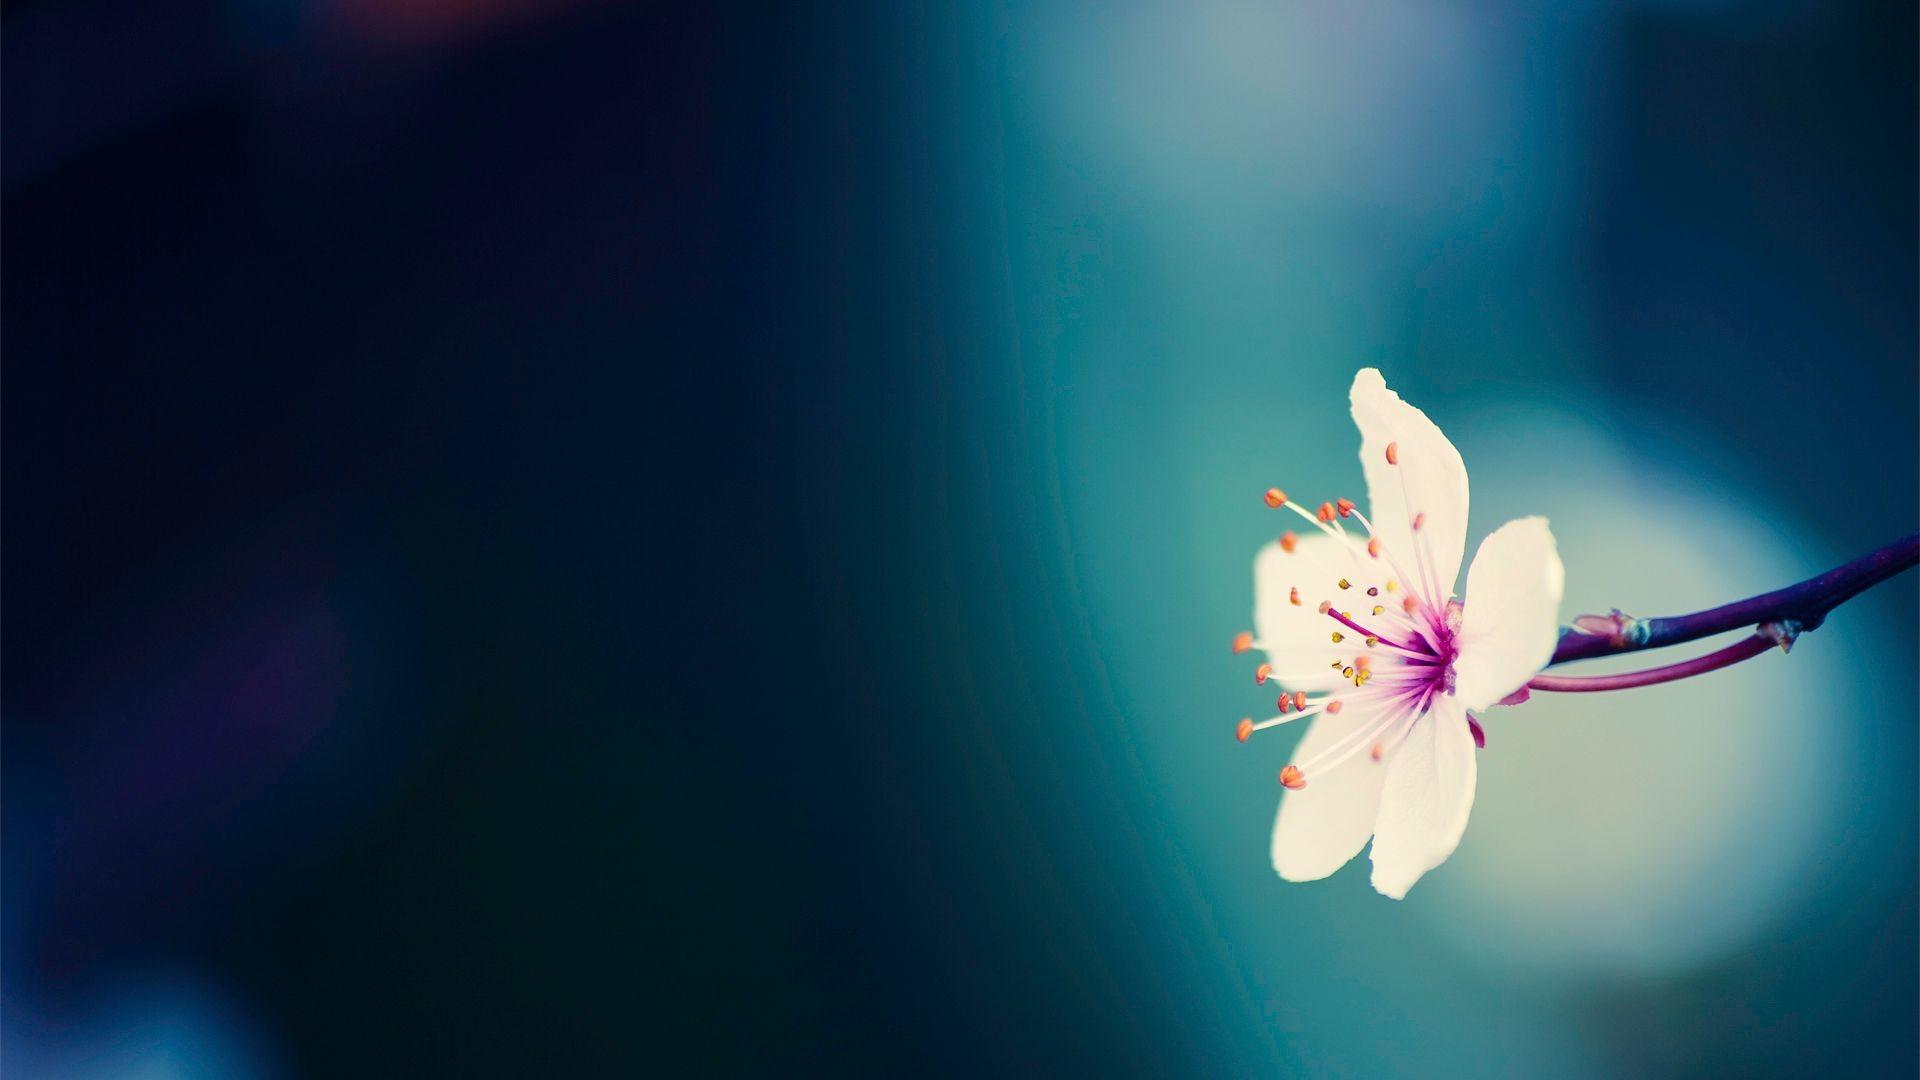 Spring Flower Wallpaper Backgrounds Wallpapertag